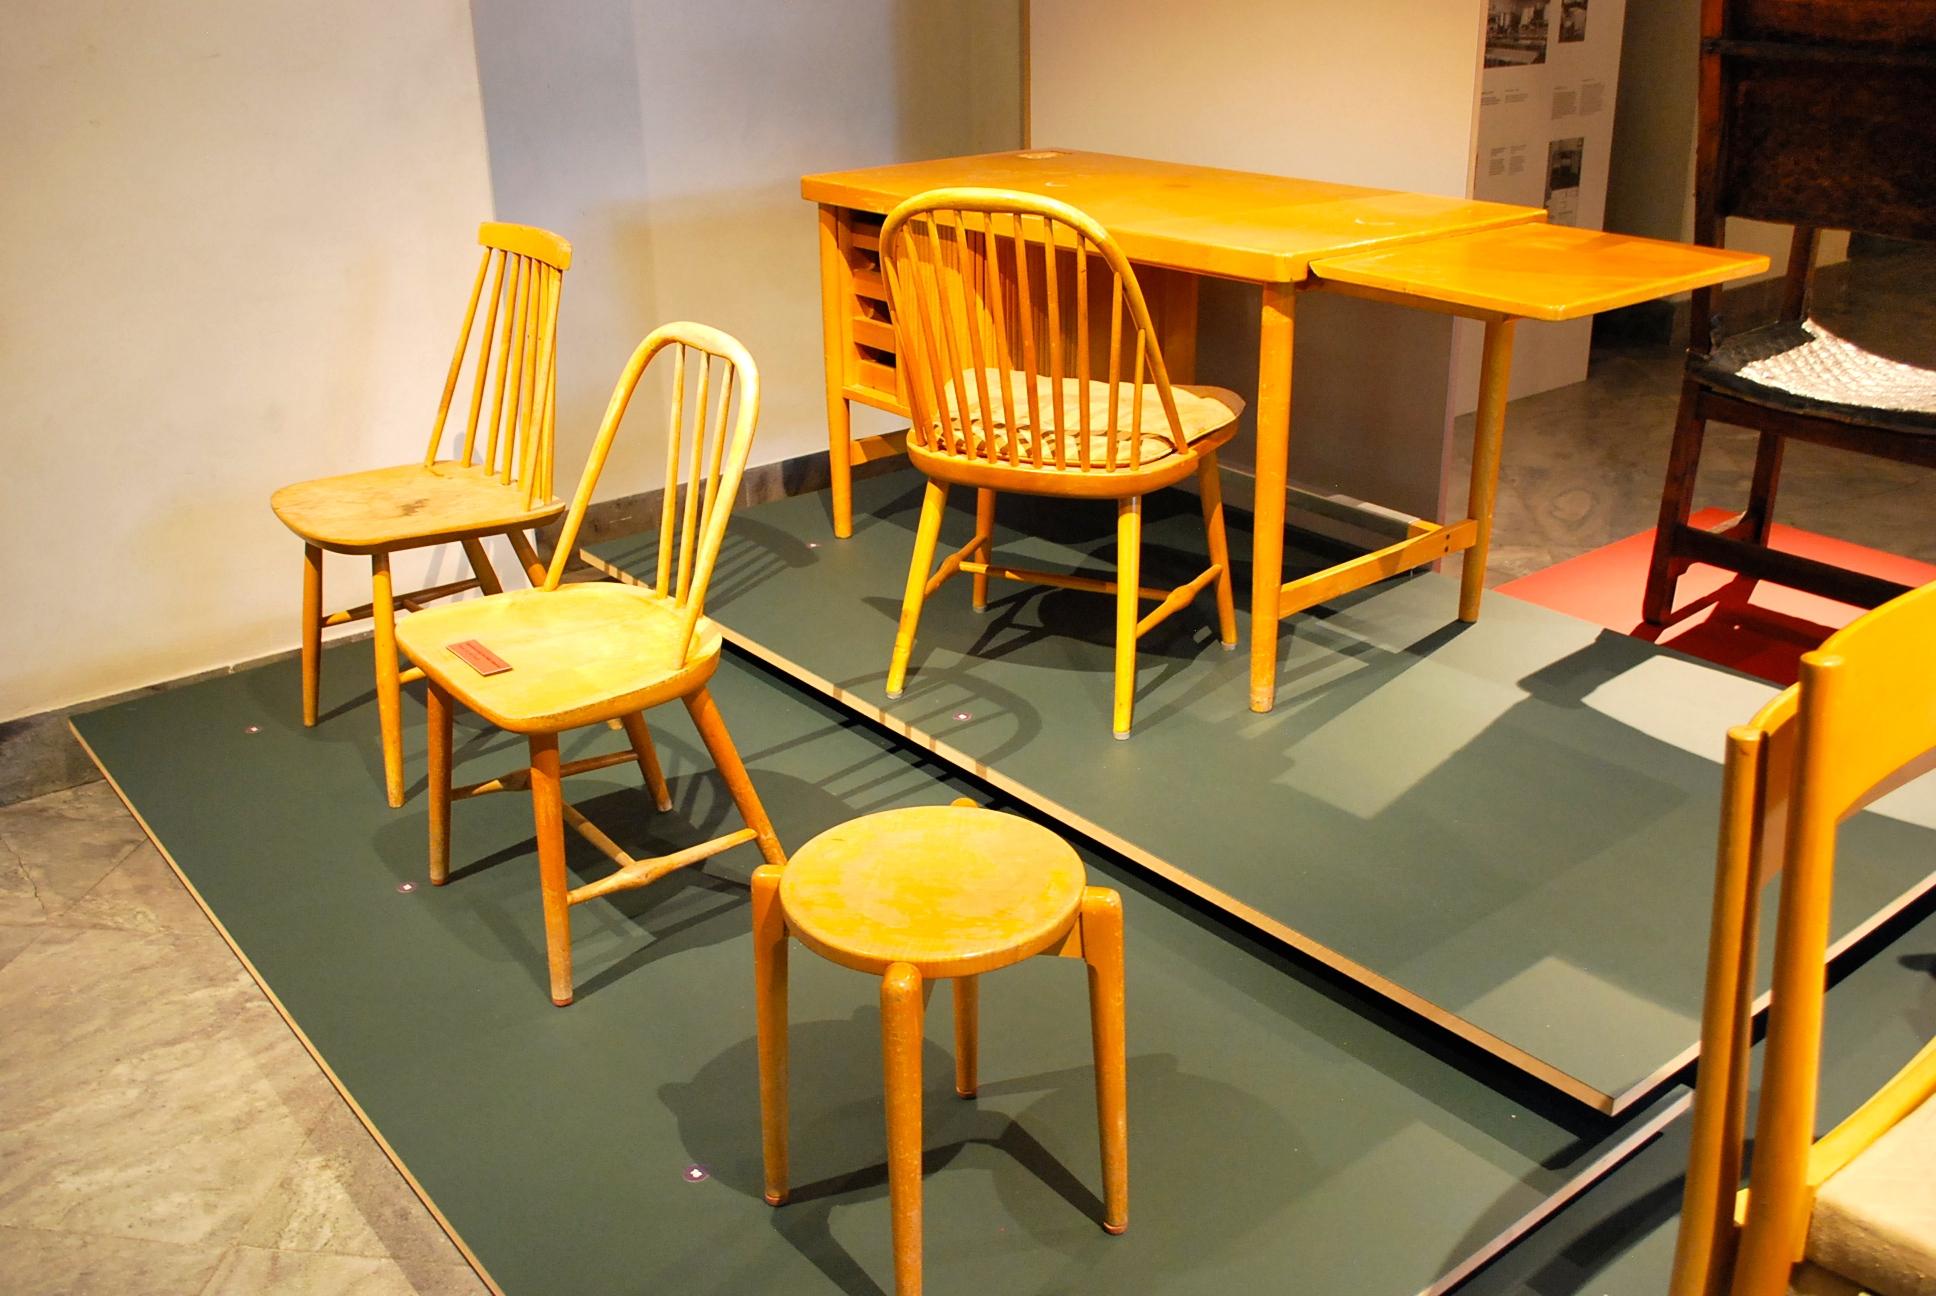 http://www.sora-design.com/images/bl-2813.JPG